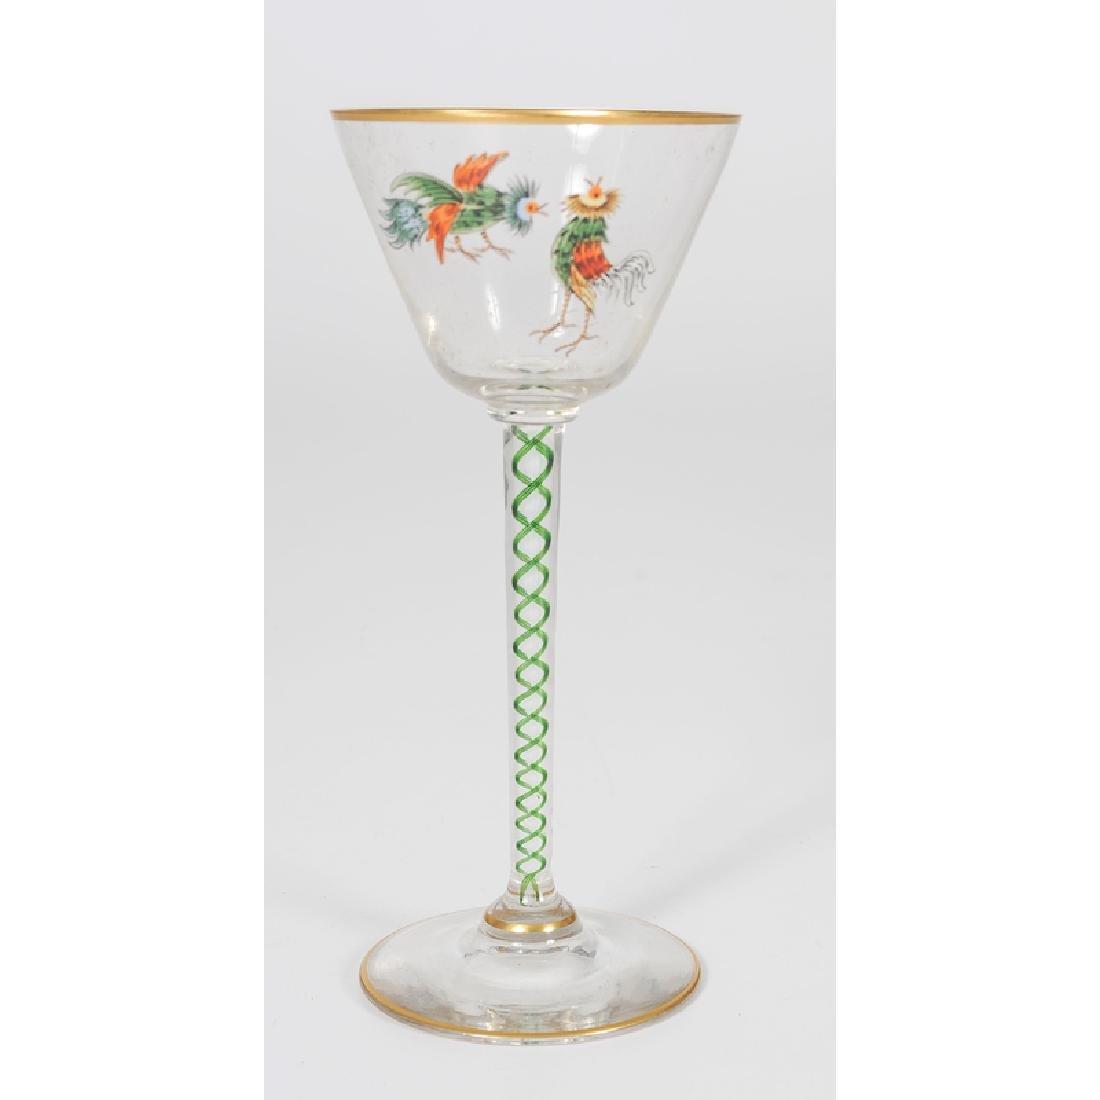 Threaded Glass Wine Glasses - 4